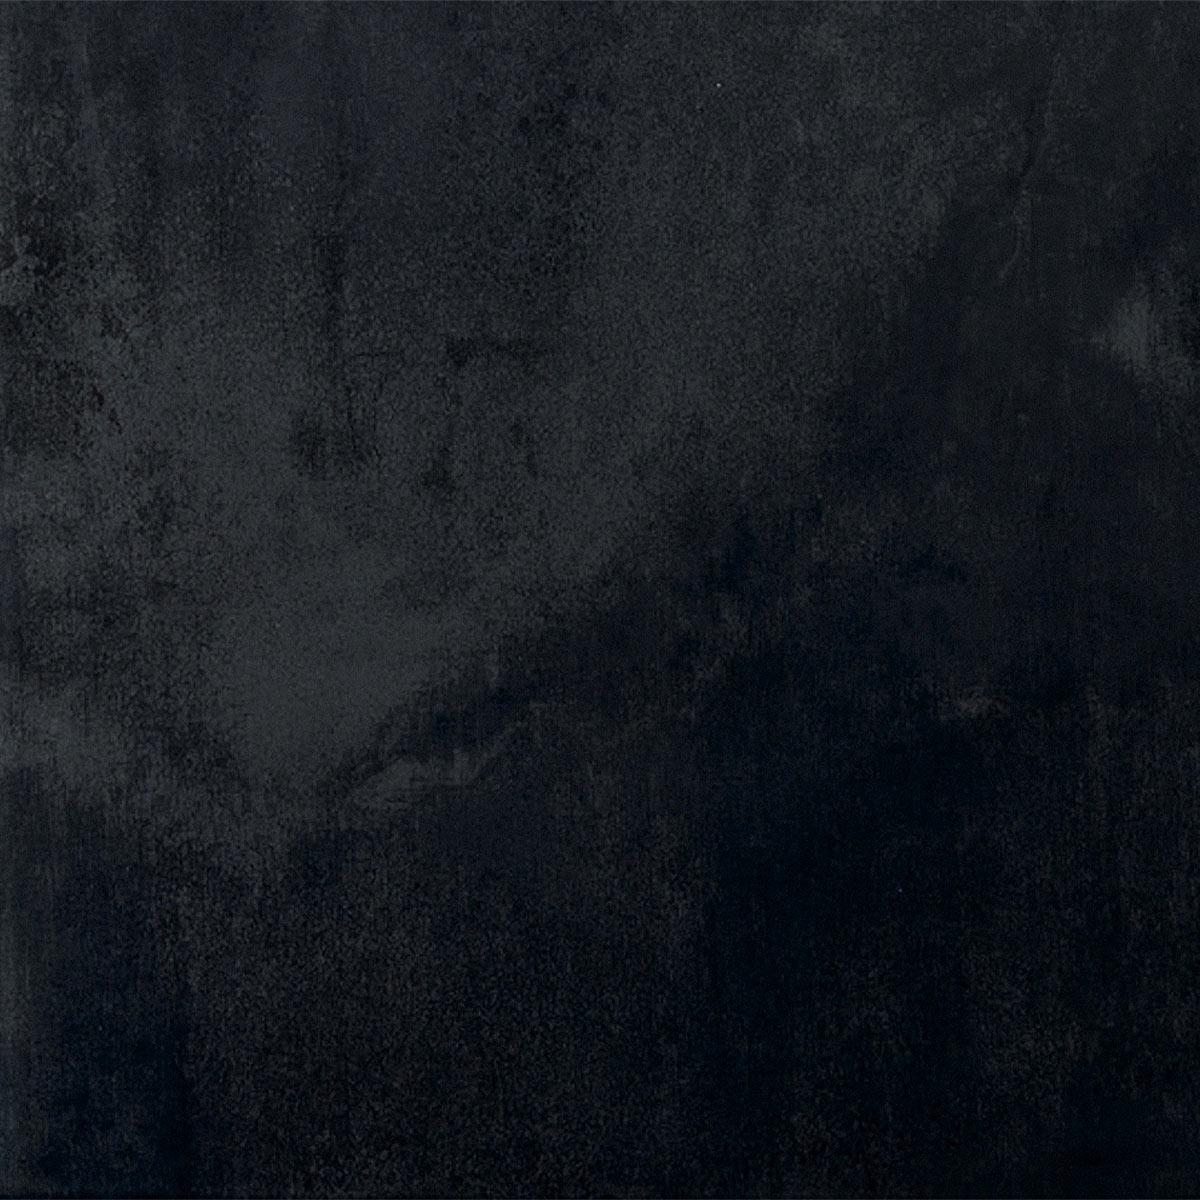 T10195 RAIN BLACK